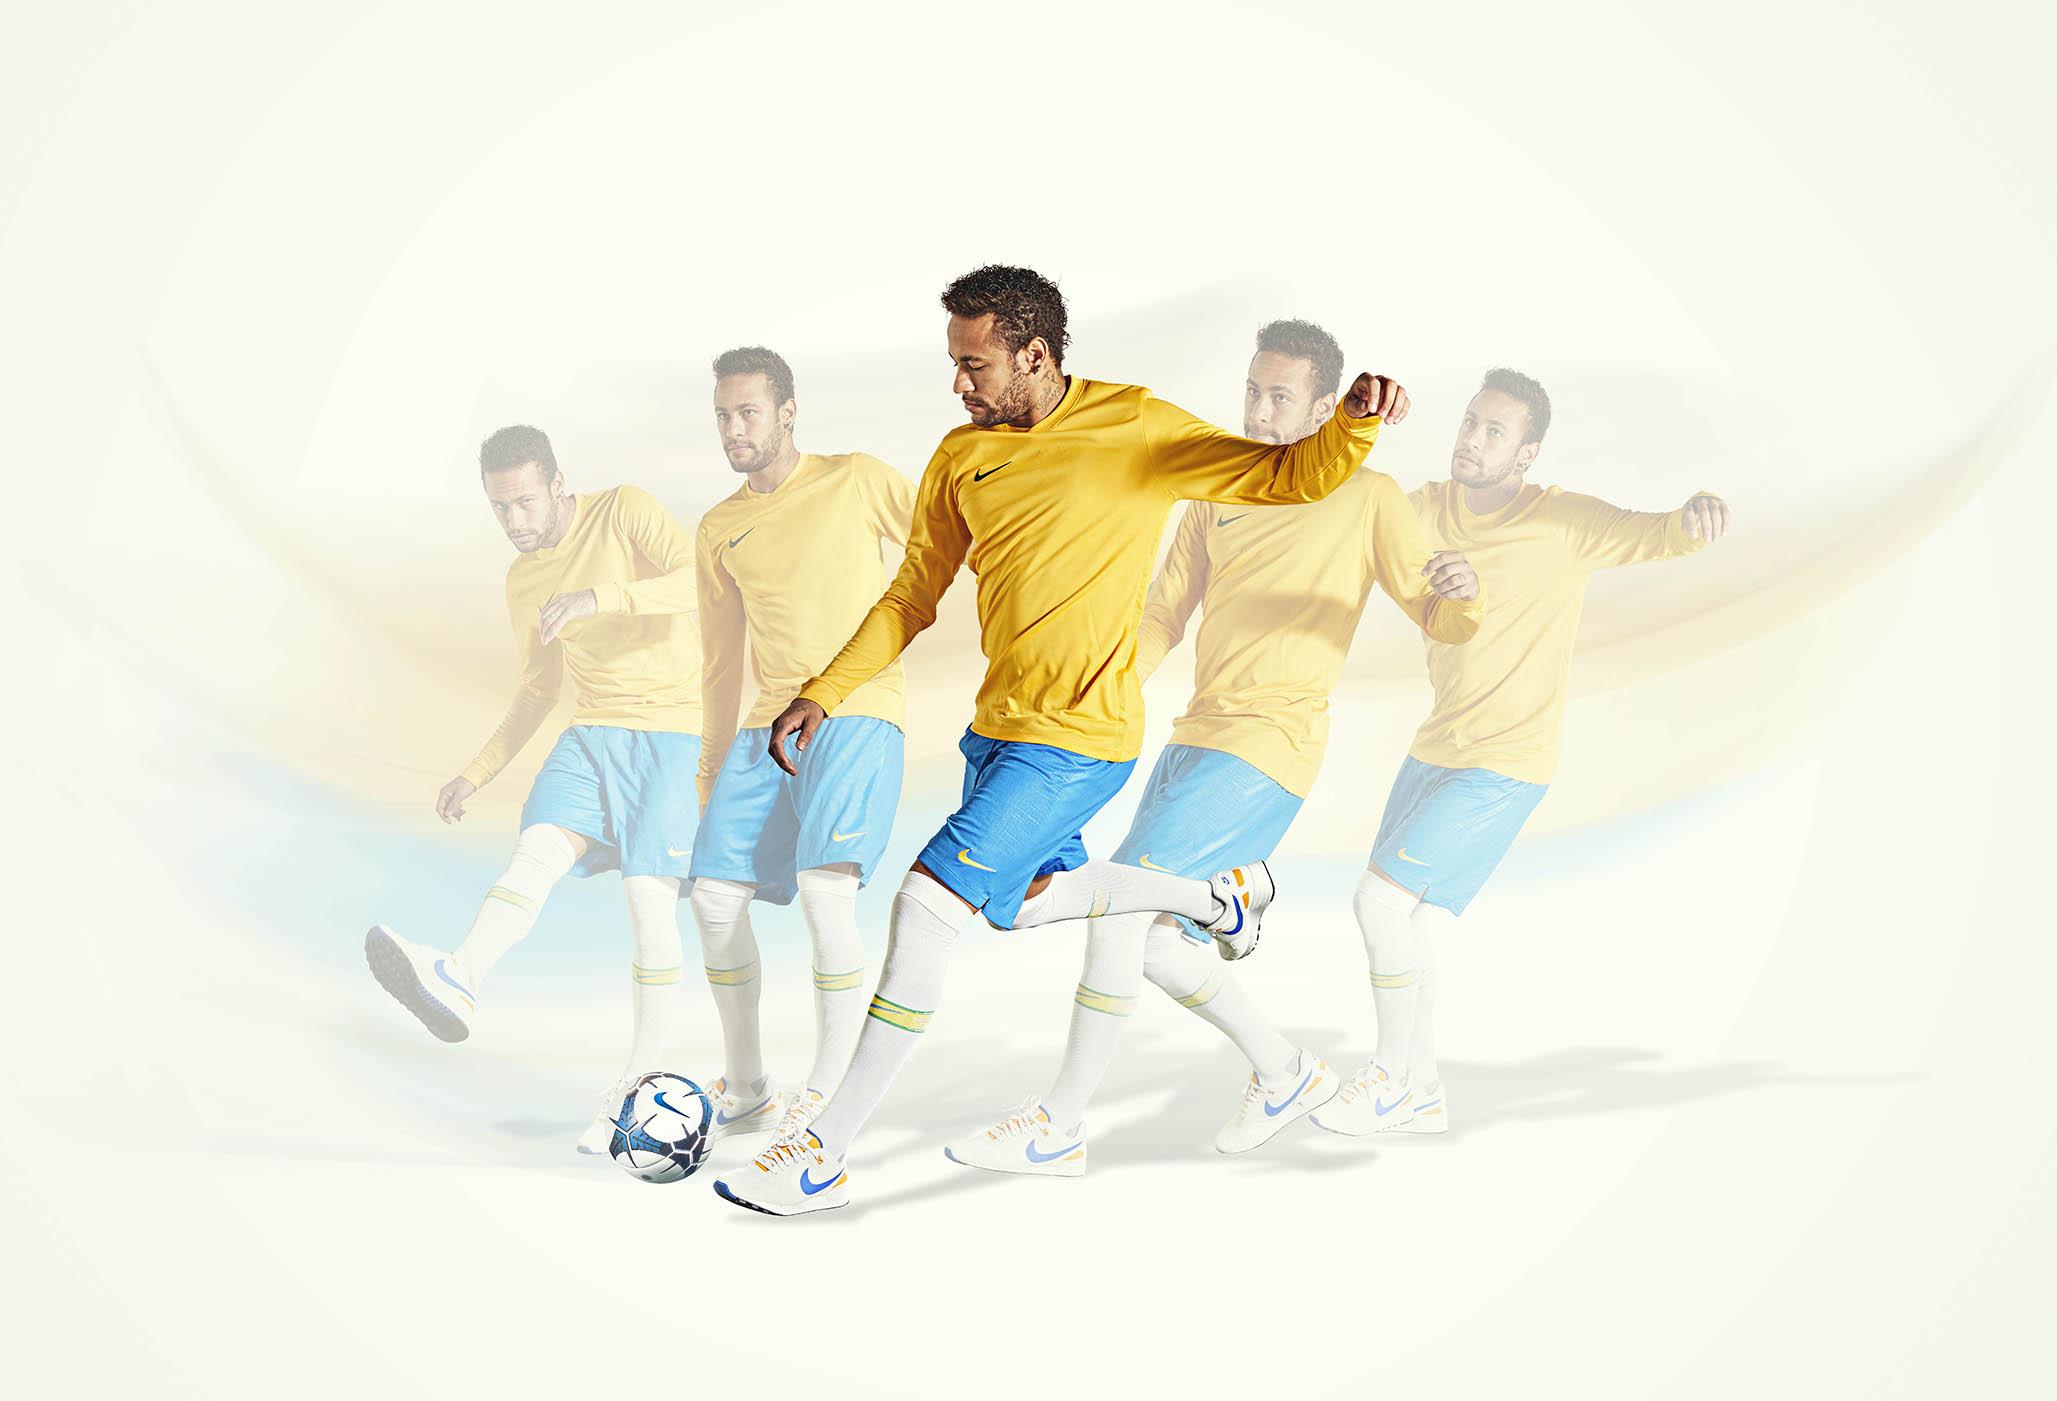 Neymar da Silva Santos Júnior, commonly known as Neymar Jr. or simply Neymar, is a Brazilian professional footballer who plays as a forward for French club Paris Saint-Germain and the Brazil national team.Jon Enoch